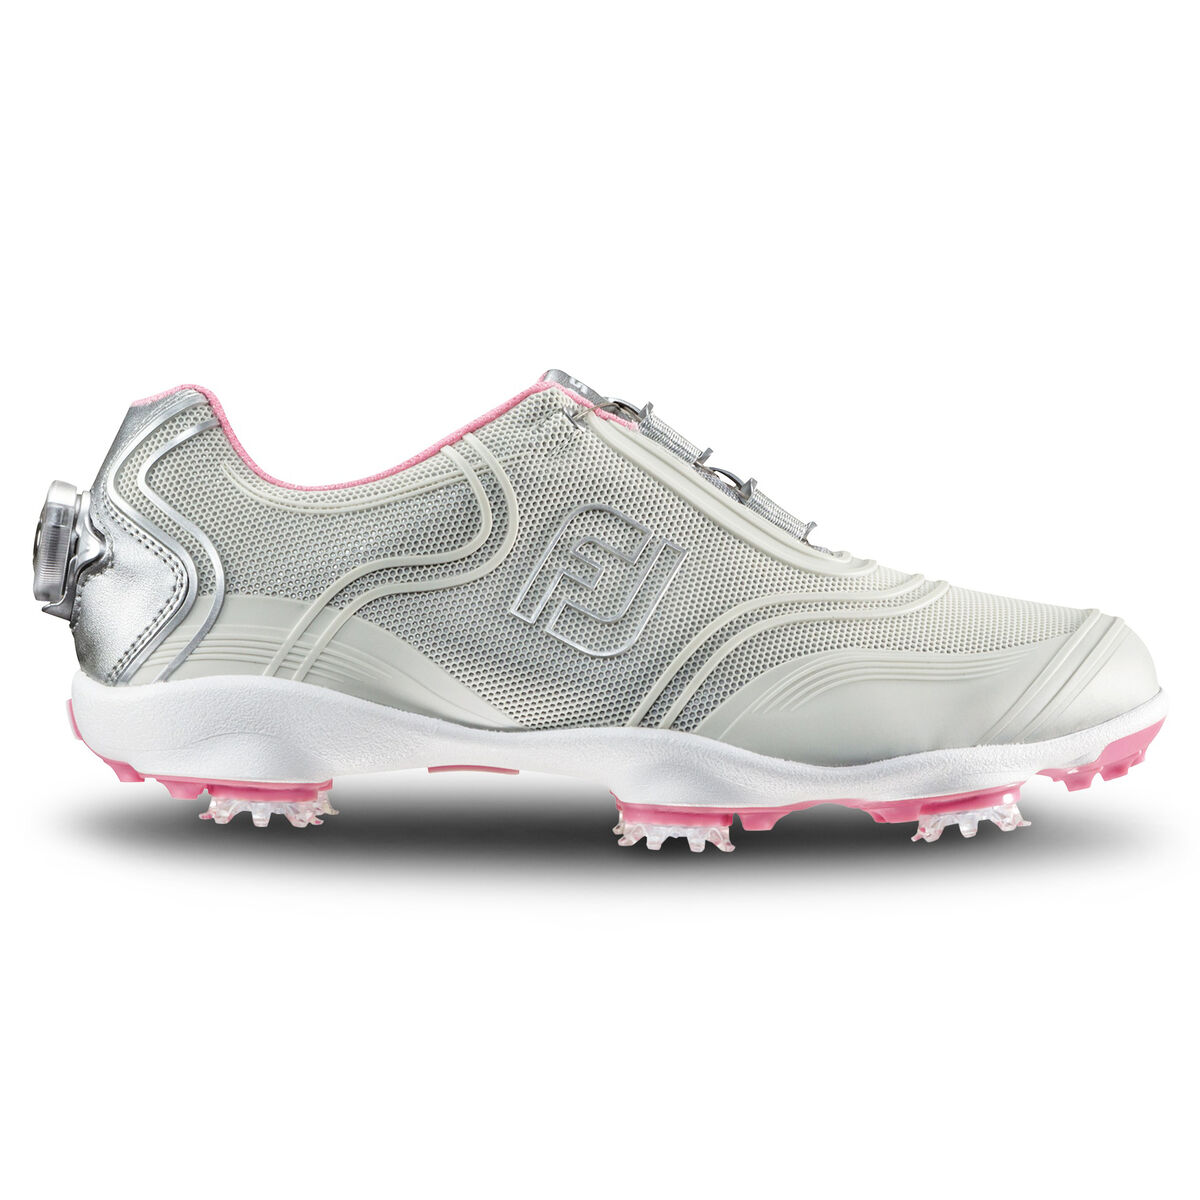 e889e966130 FootJoy Aspire Boa Women s Golf Shoe - Light Grey